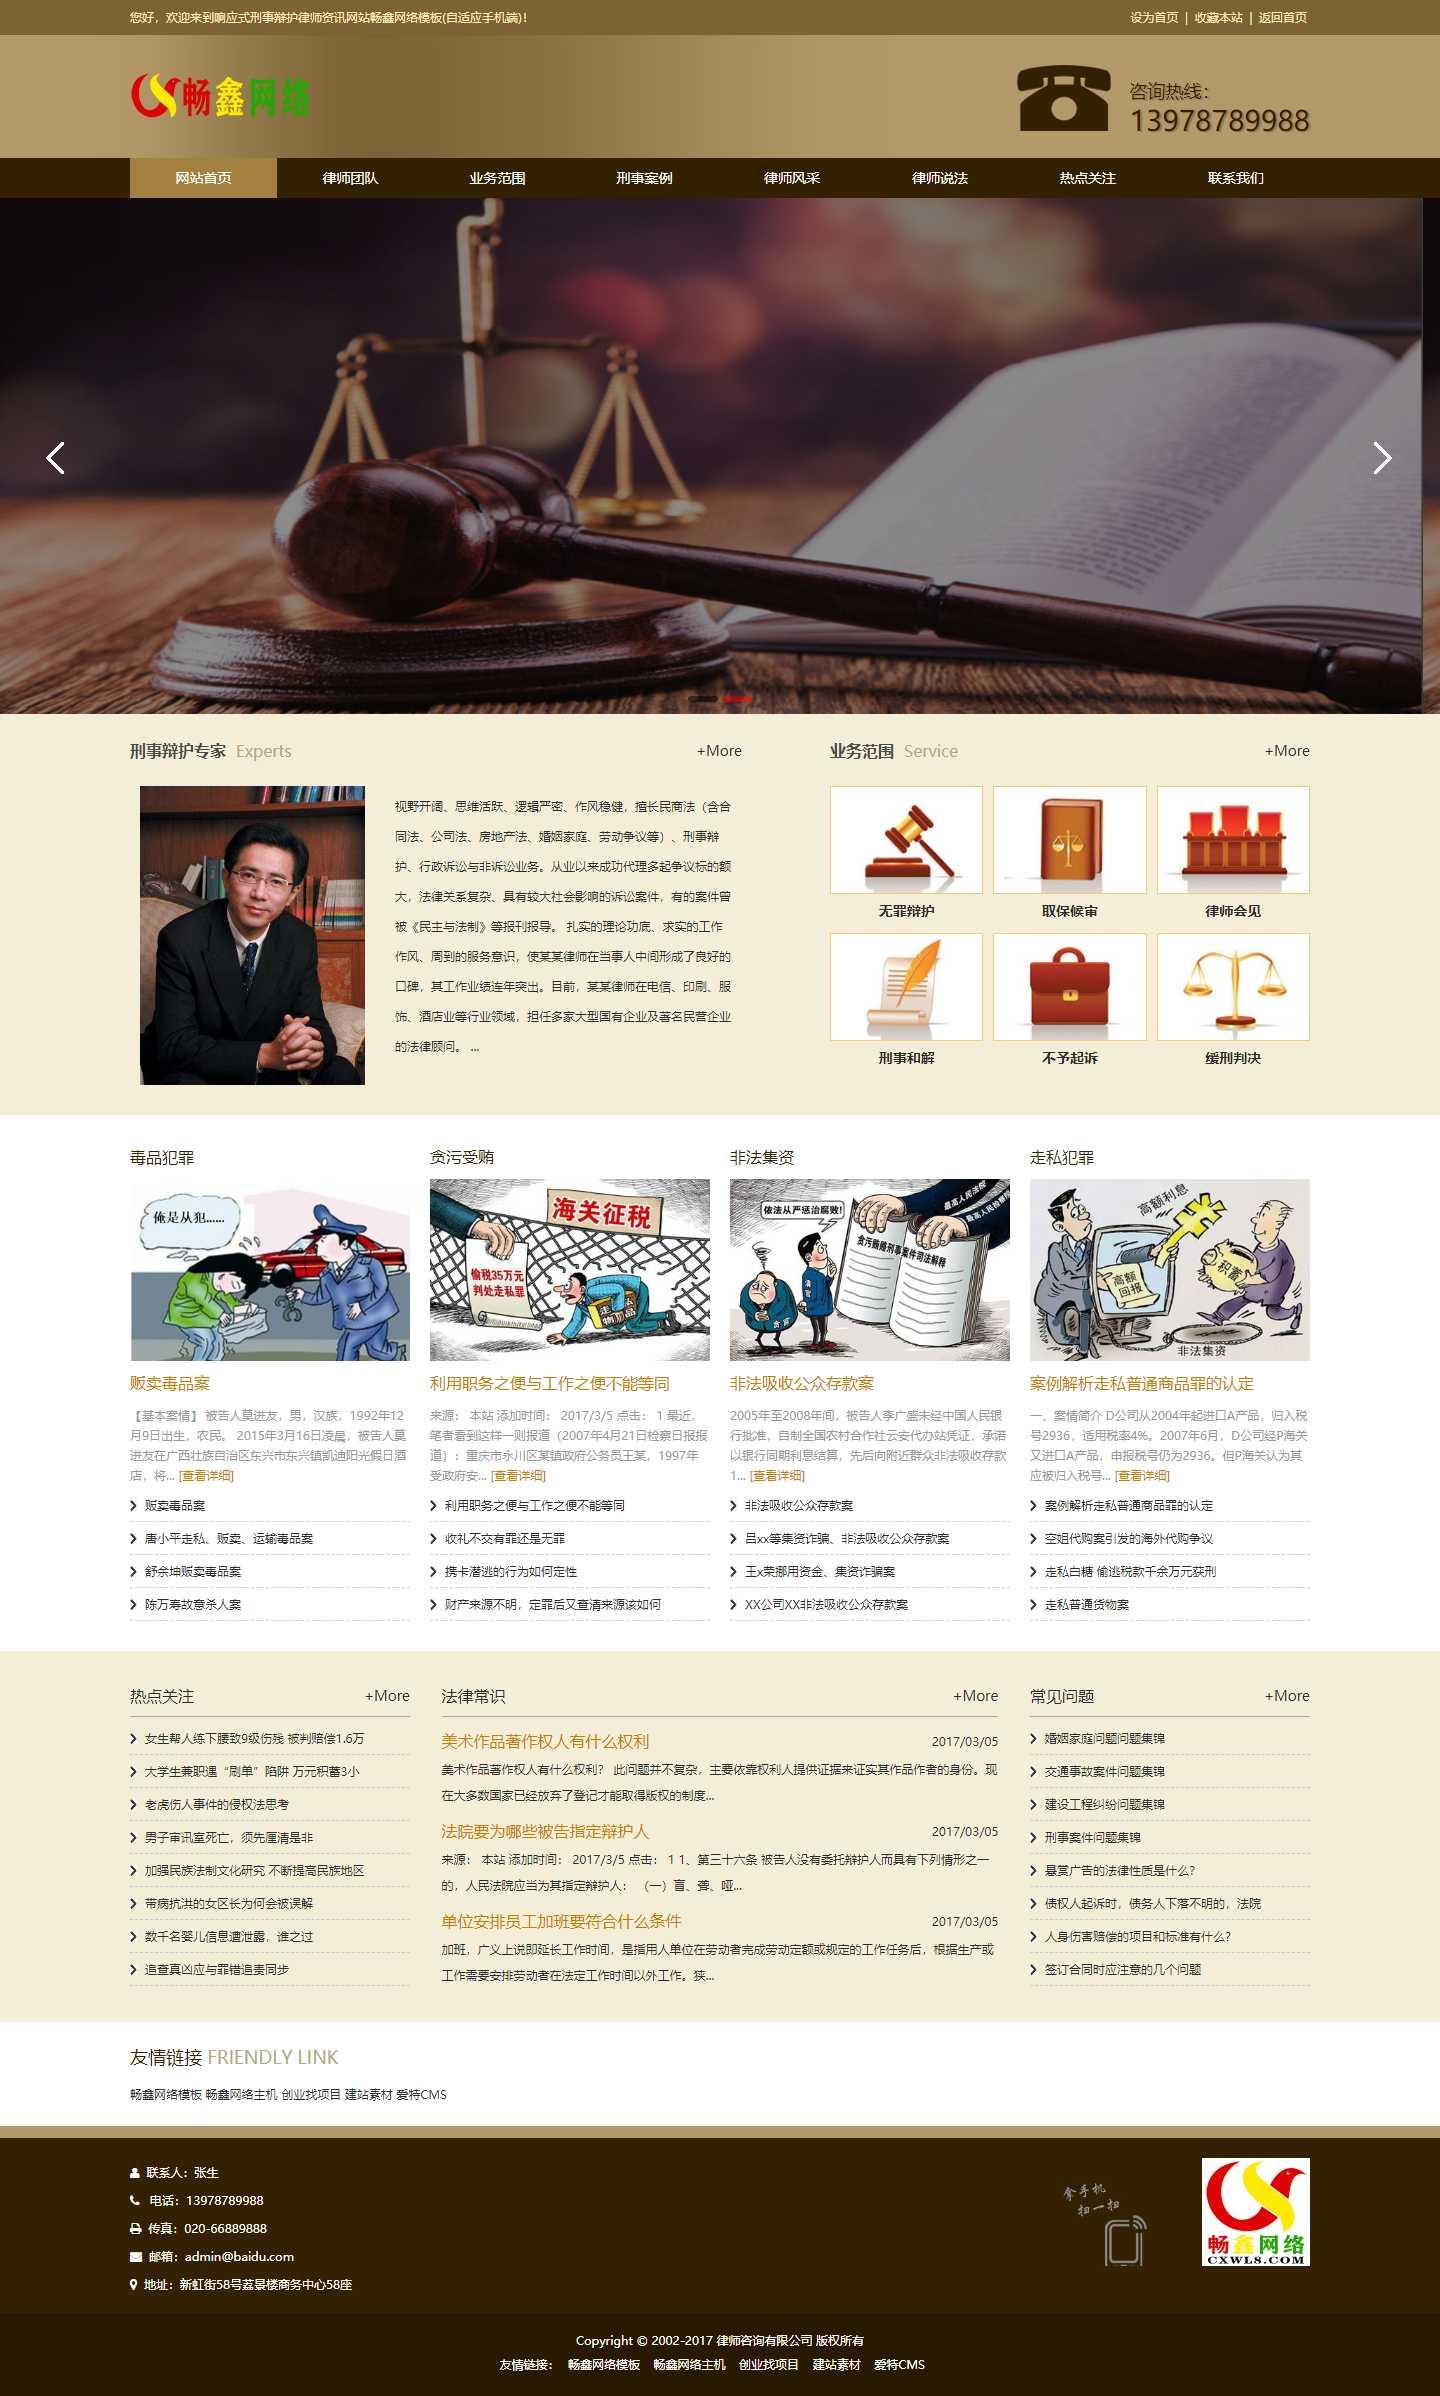 【J033】刑事辩护律师资讯网